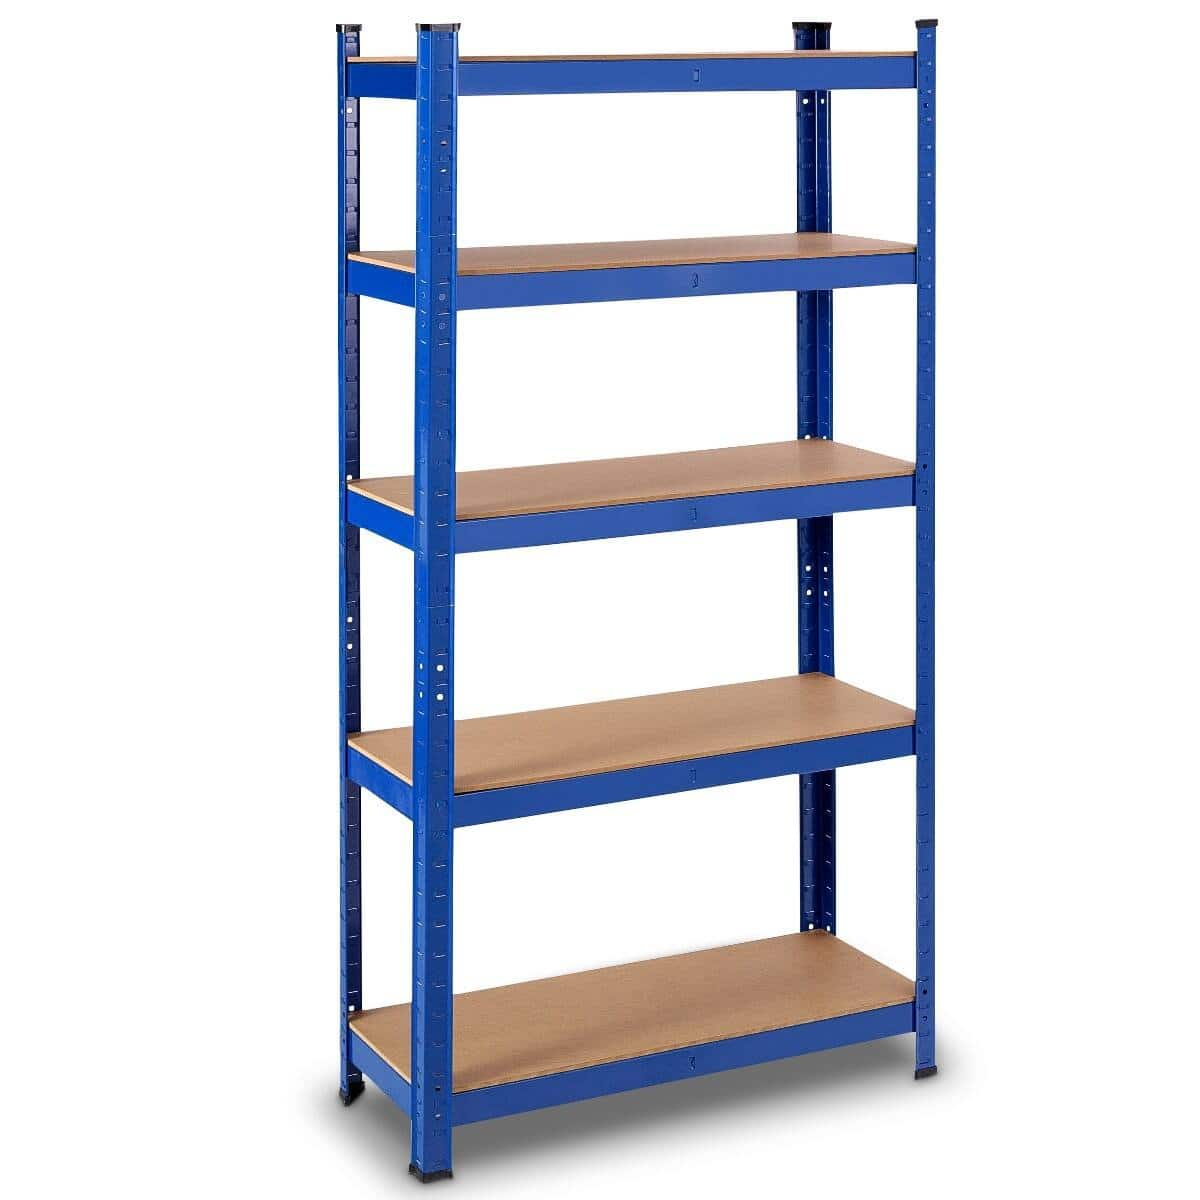 Costway Adjust 30 x60 Inch 5 Level Garage Tool Shelf Storage $51.95 + Free Shipping